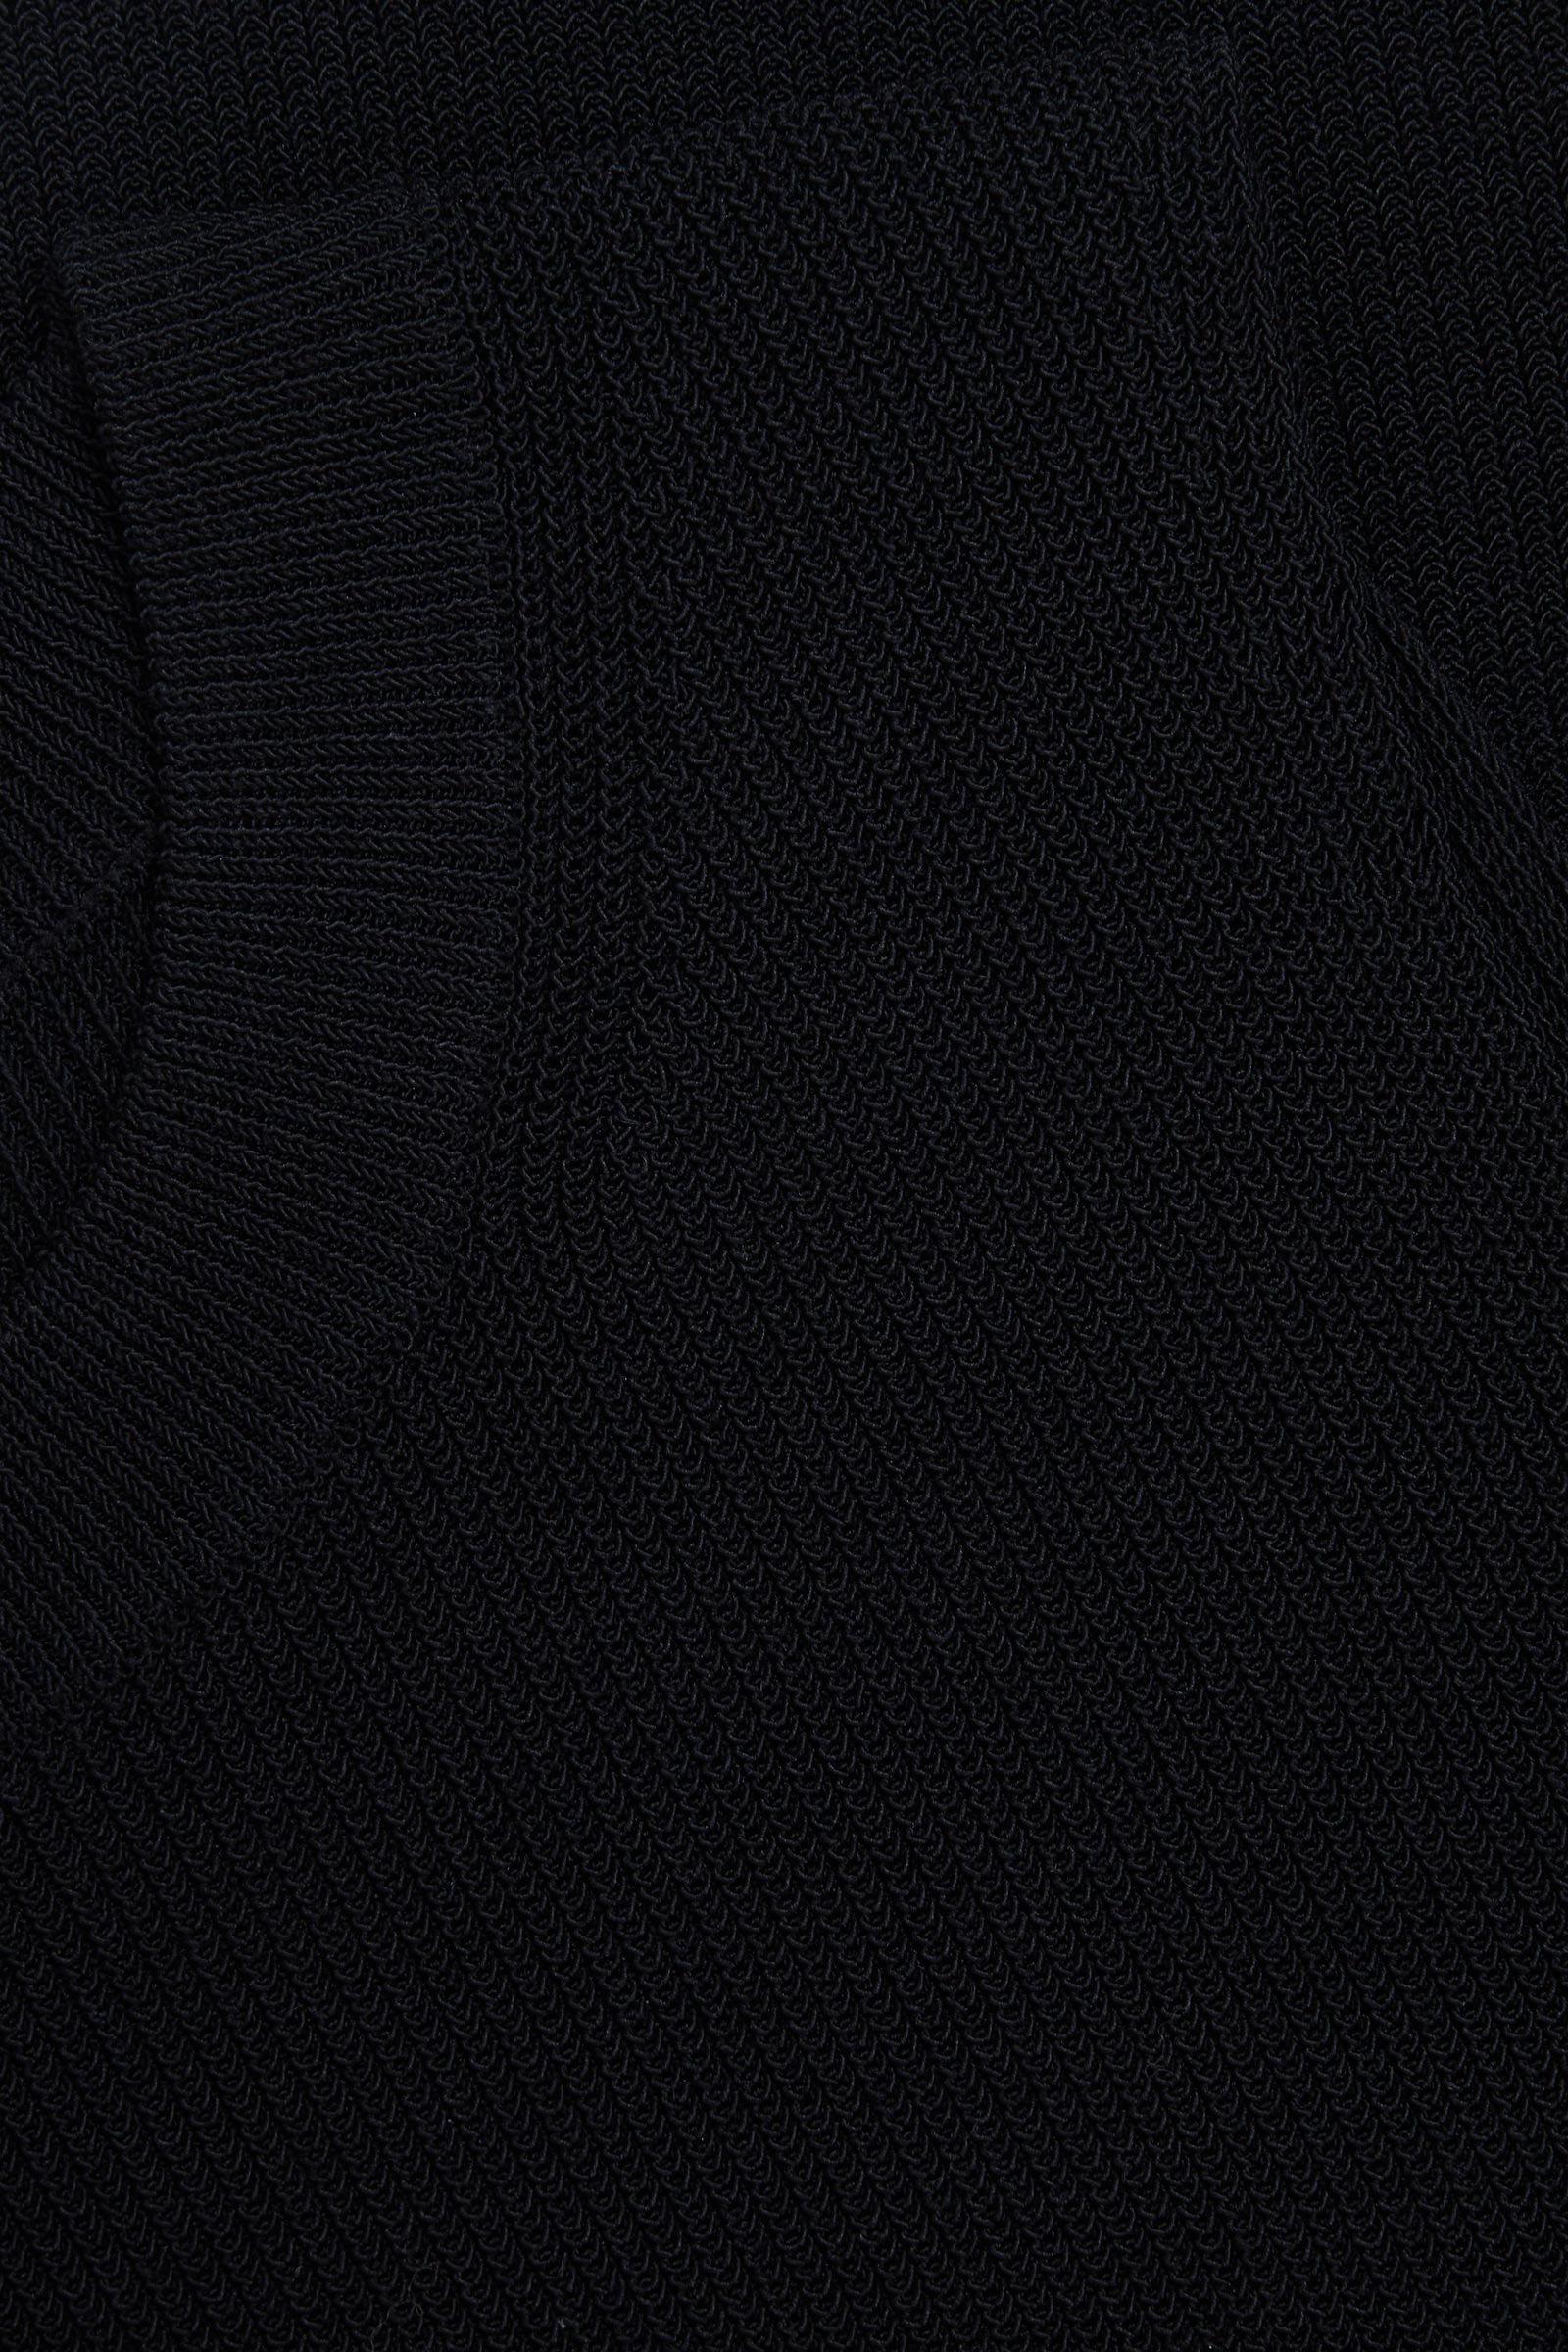 COS 니티드 코튼 믹스 베스트 탑의 블랙컬러 Detail입니다.